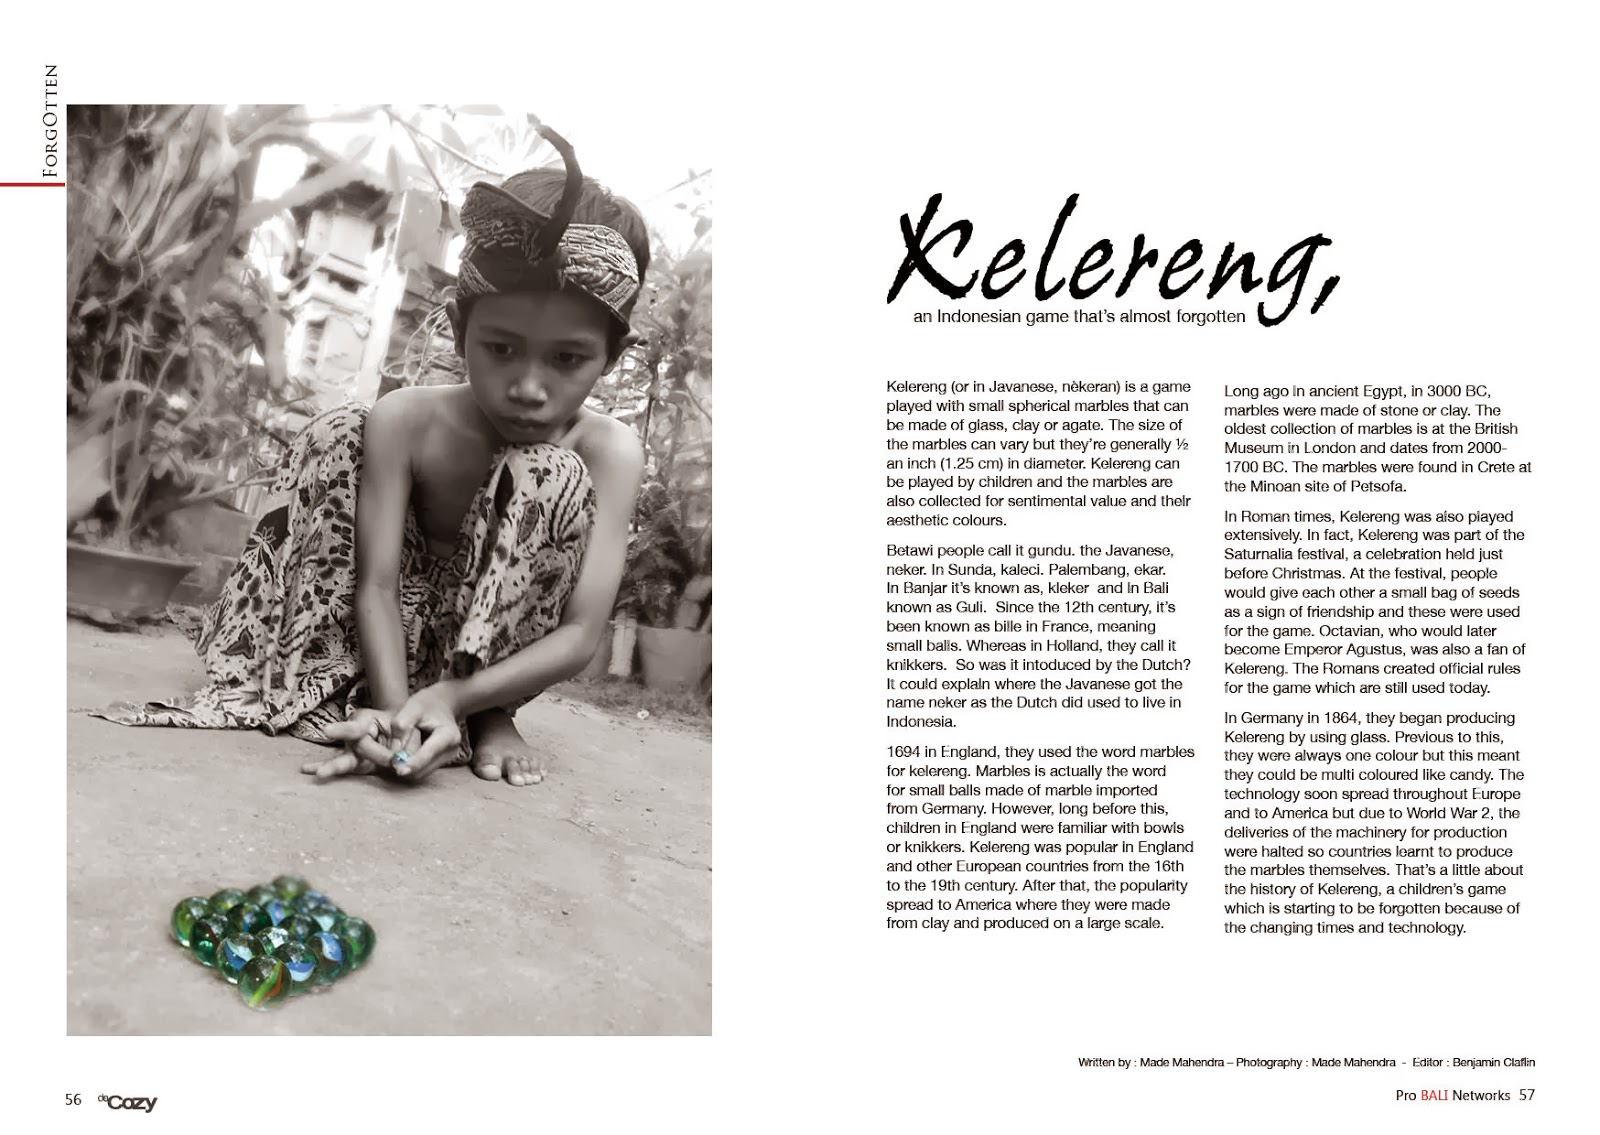 Decozy Forgotten Kelereng Neker